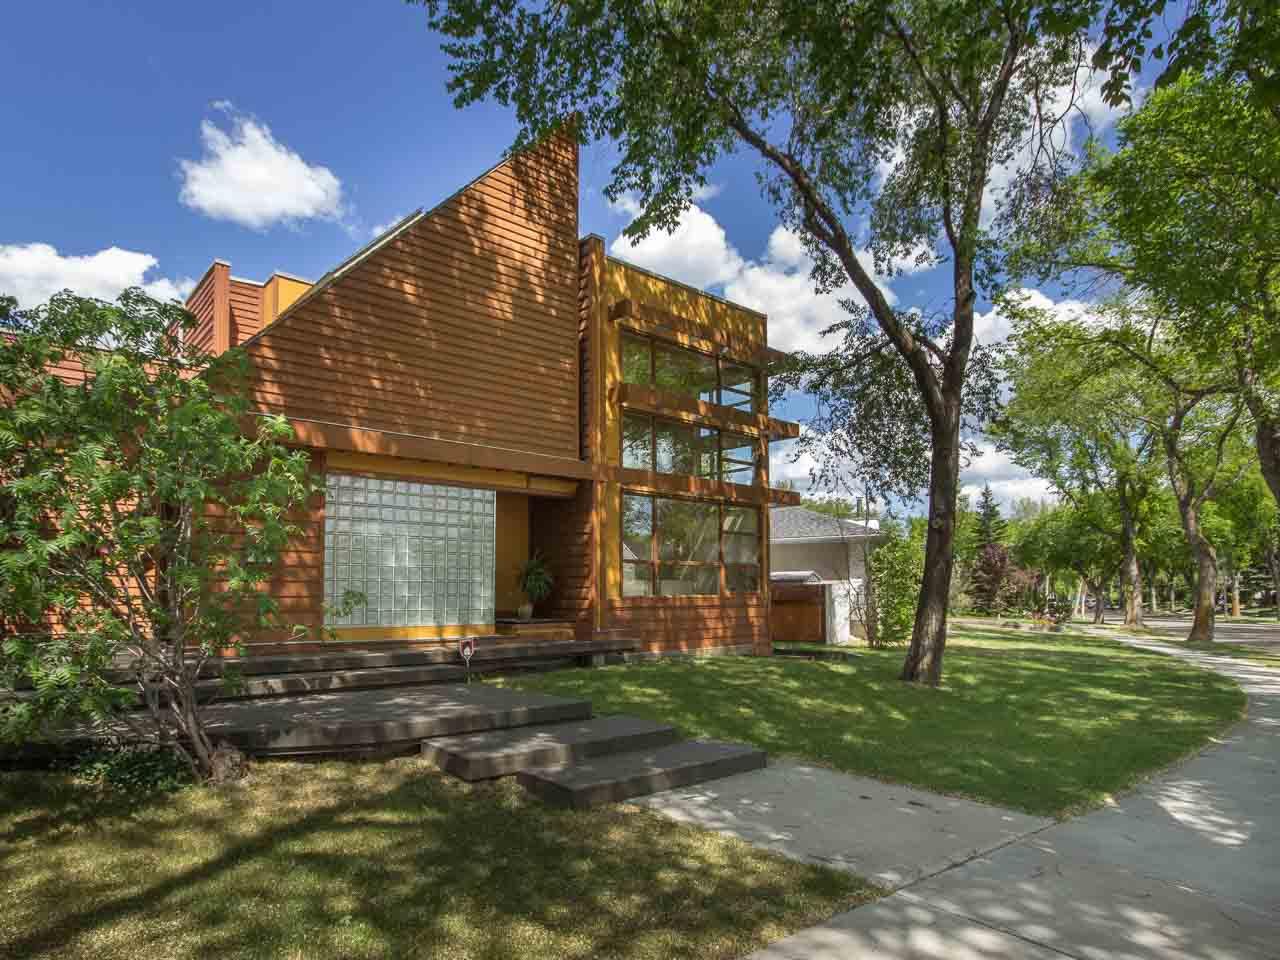 Main Photo:  in Edmonton: House for sale : MLS®# E4022342